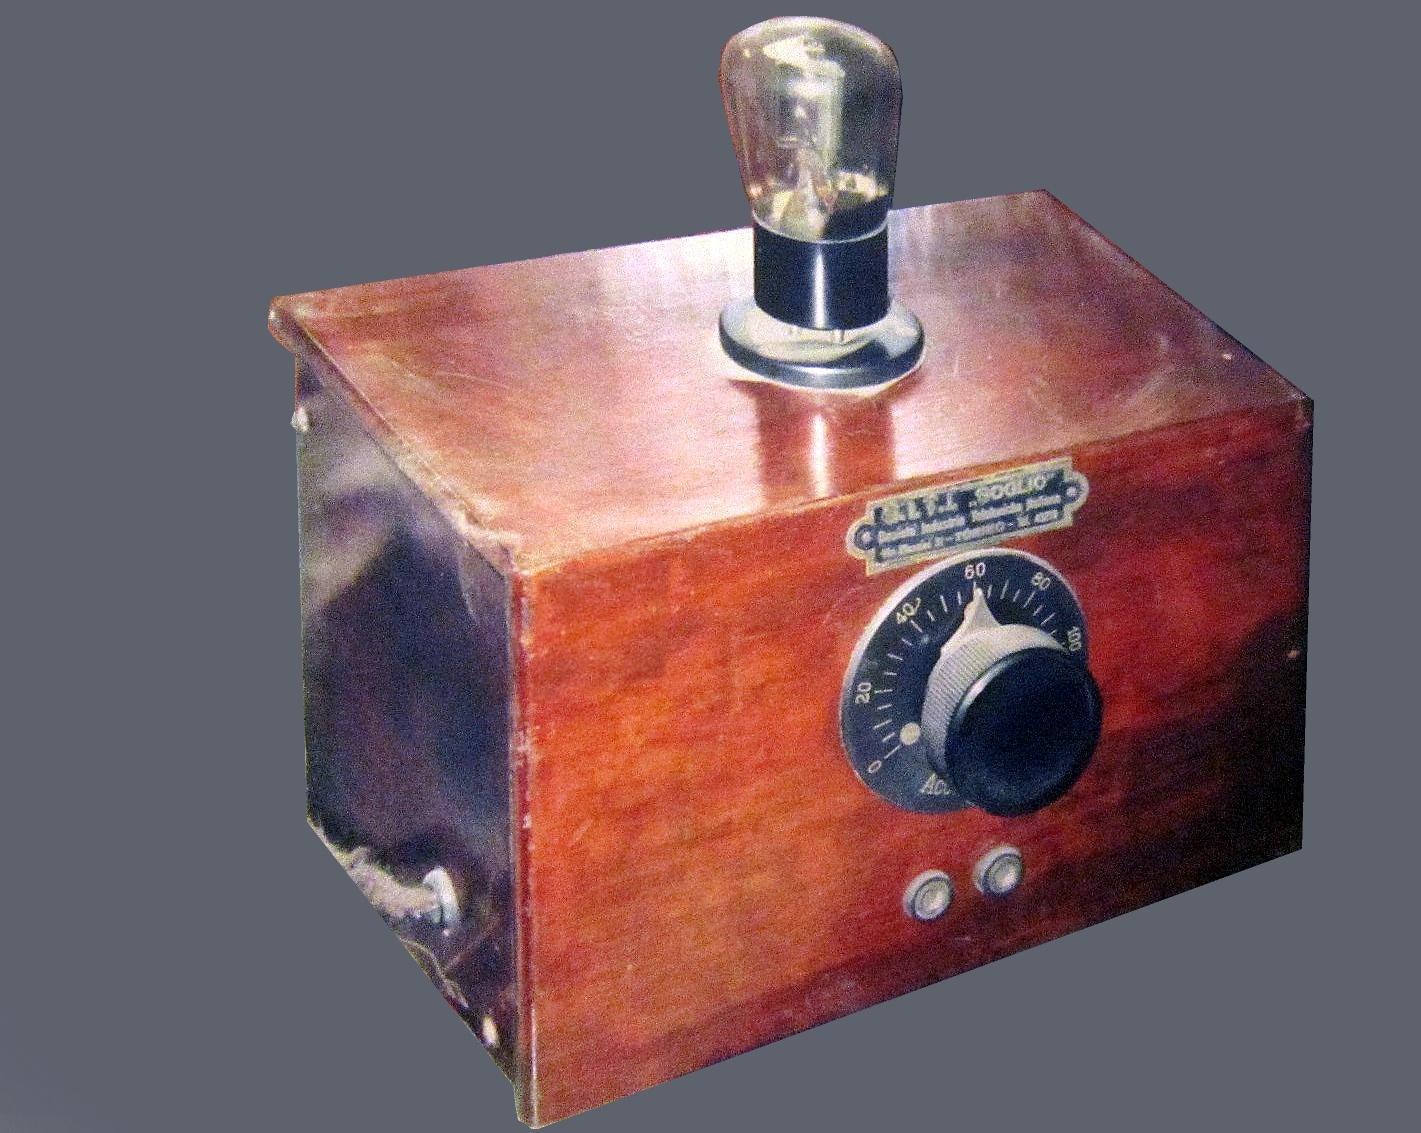 Radio SITI A 1 amplificatore a 1 valvola